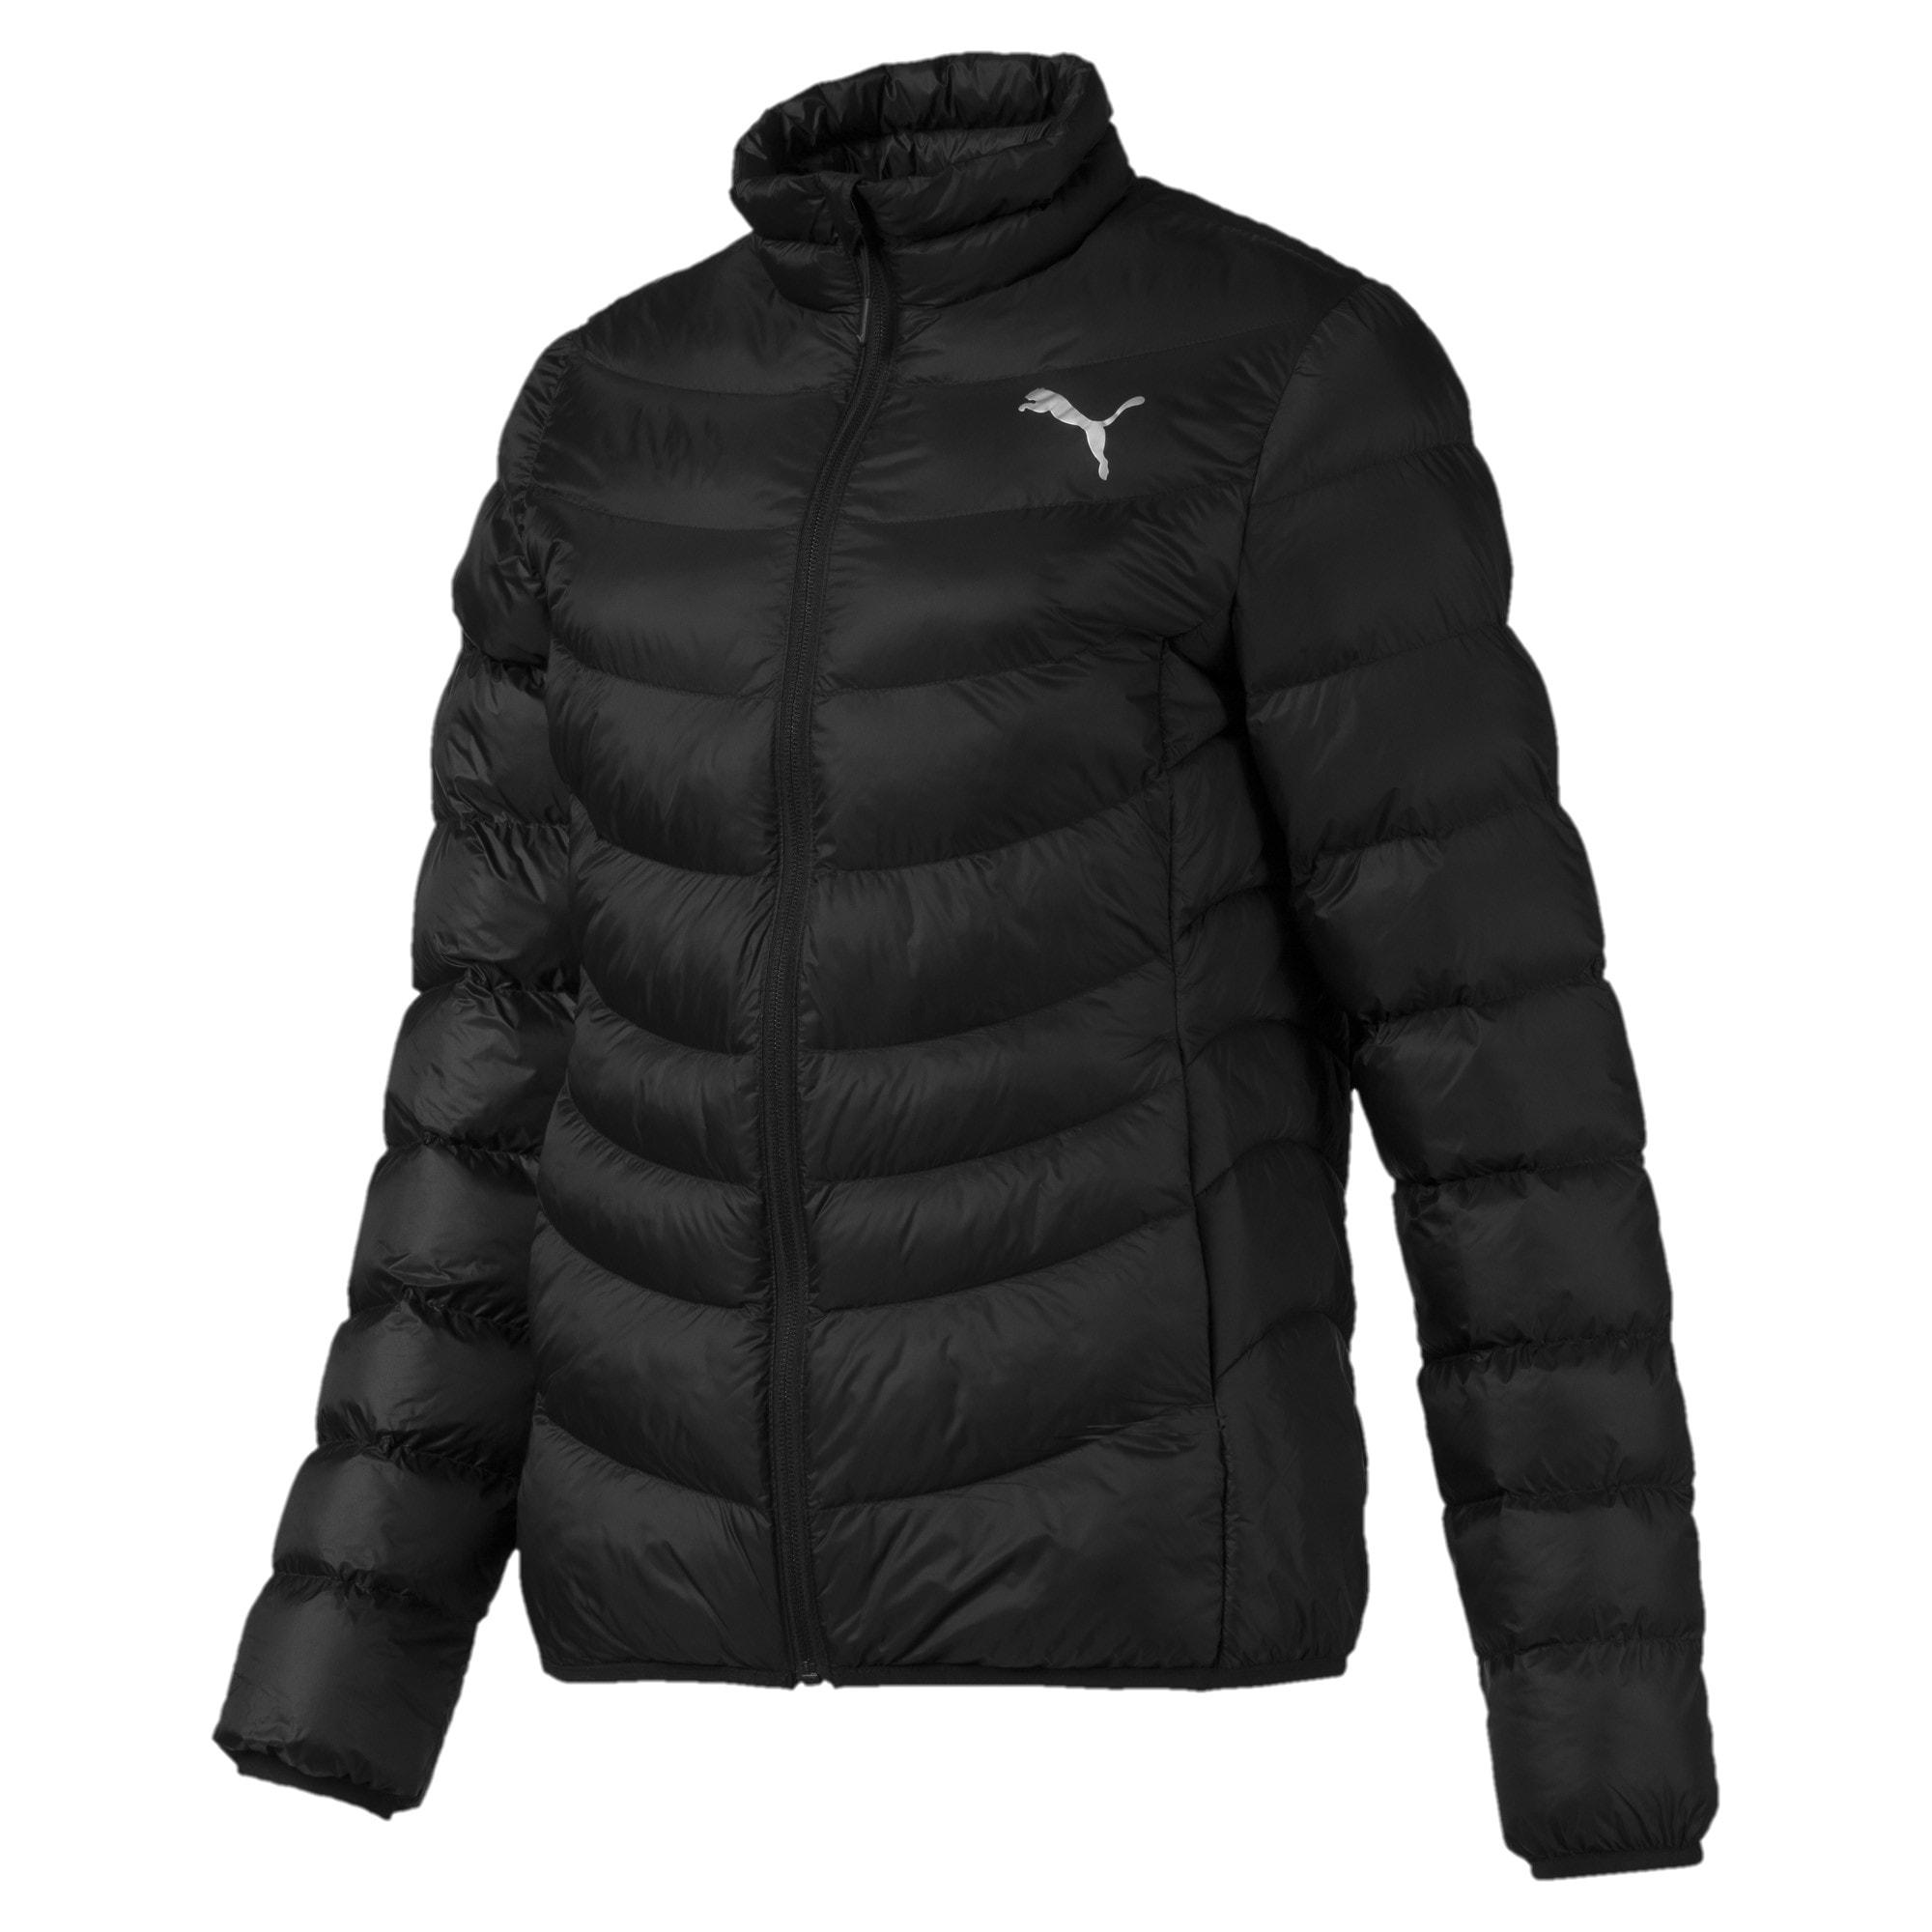 Thumbnail 4 of Ultralight warmCELL Women's Jacket, Puma Black, medium